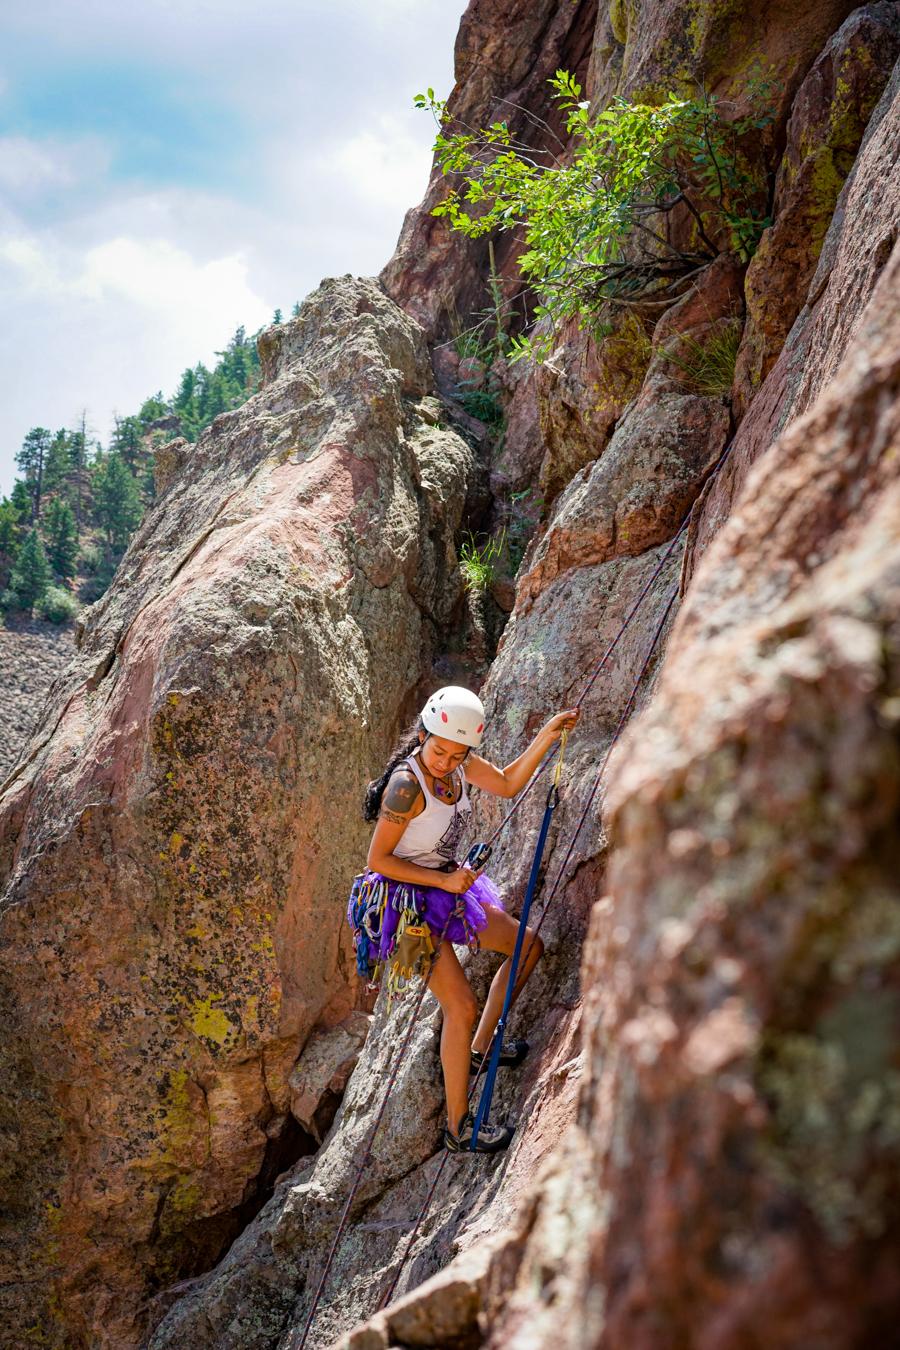 Montserrat-A.-Matehuala-Pick-off-Climbing-Rescue-Photo-by-Janelle-Paciencia